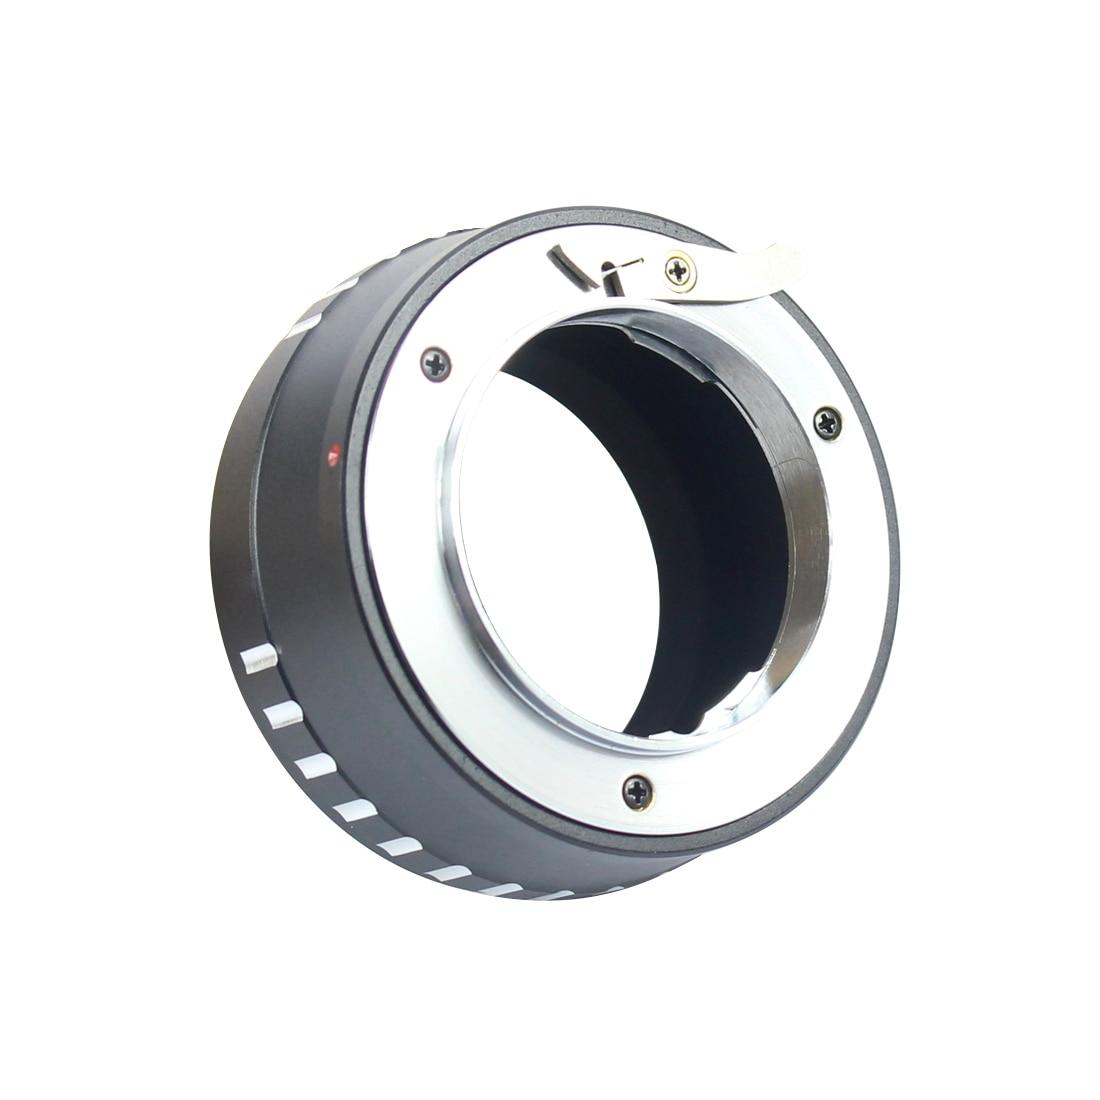 Alloy&Brass Camera Lens Adapter Ring Part  for Exakta EXA to for Sony NEX E Mount NEX7 NEX-5N NEX5 NEX3 Convert Lens Adapter